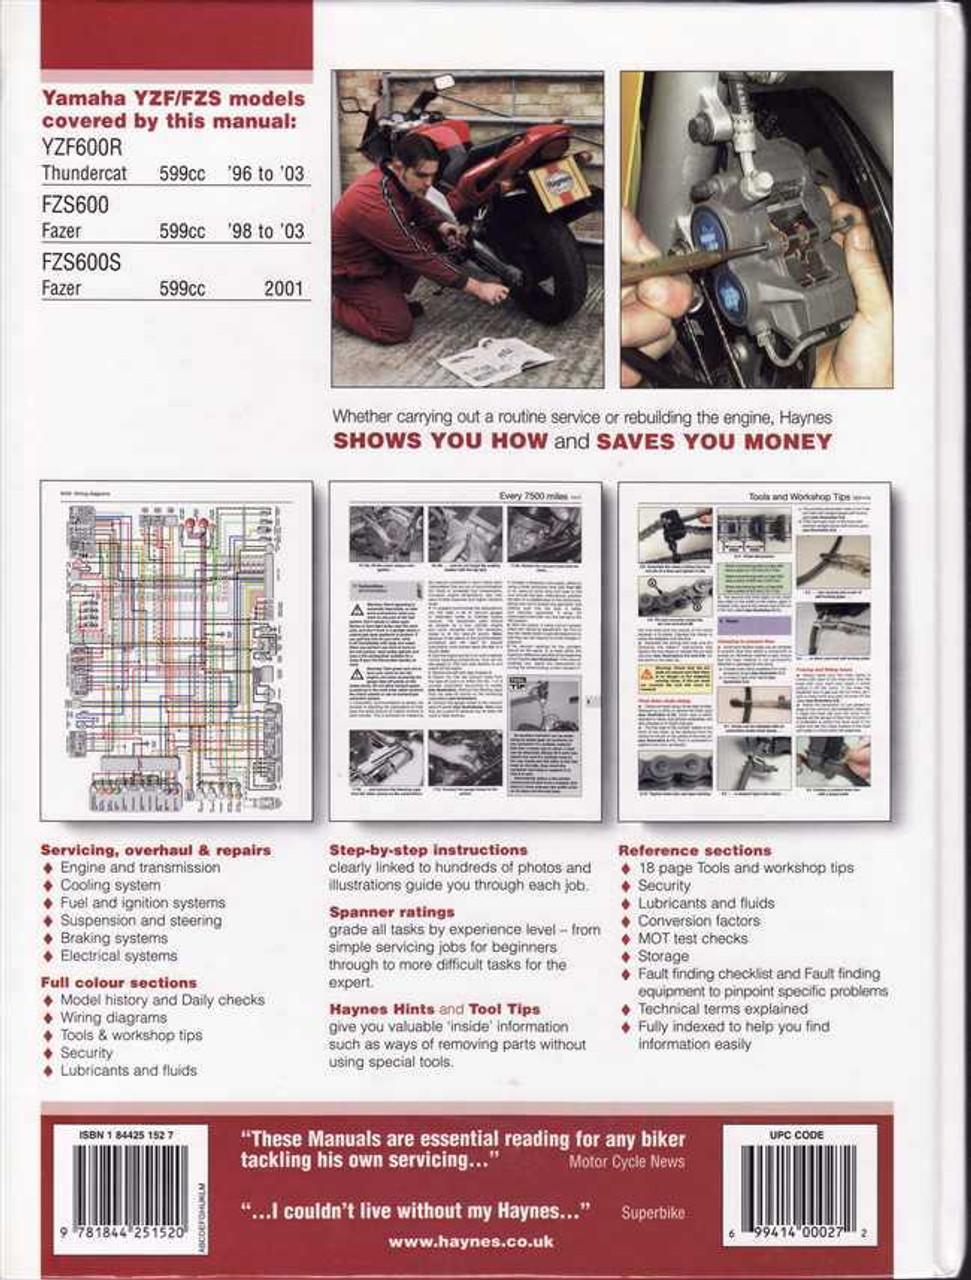 yamaha yzf600r thundercat, fzs600, fzs600s fazer 1996 - 2003 workshop manual